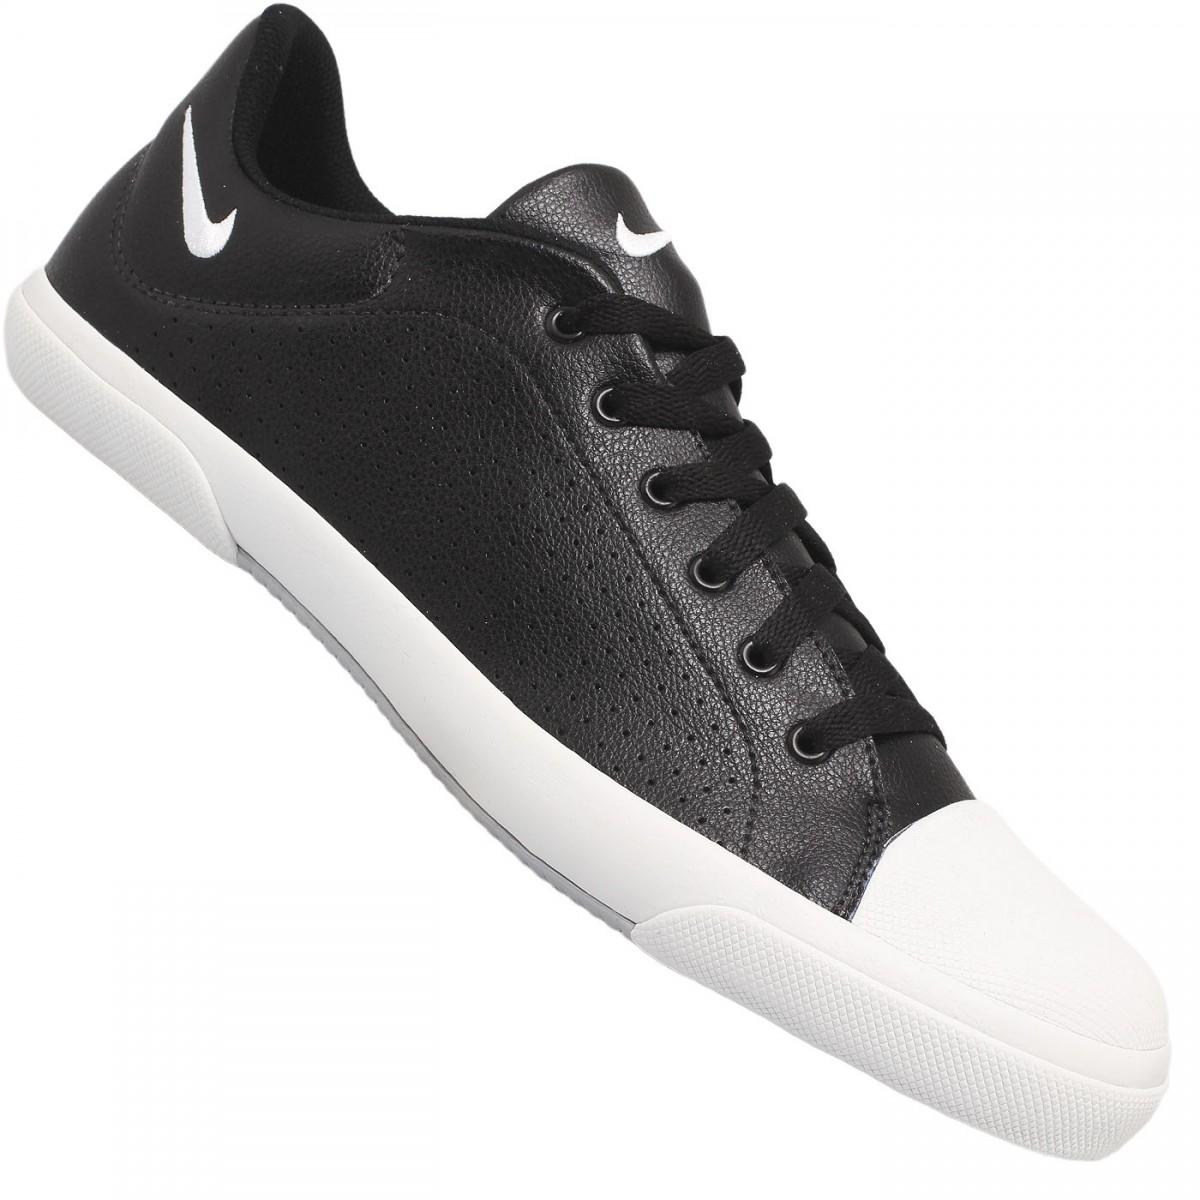 d7e15b0c1e2 Tênis Nike Biscuit 2 SL